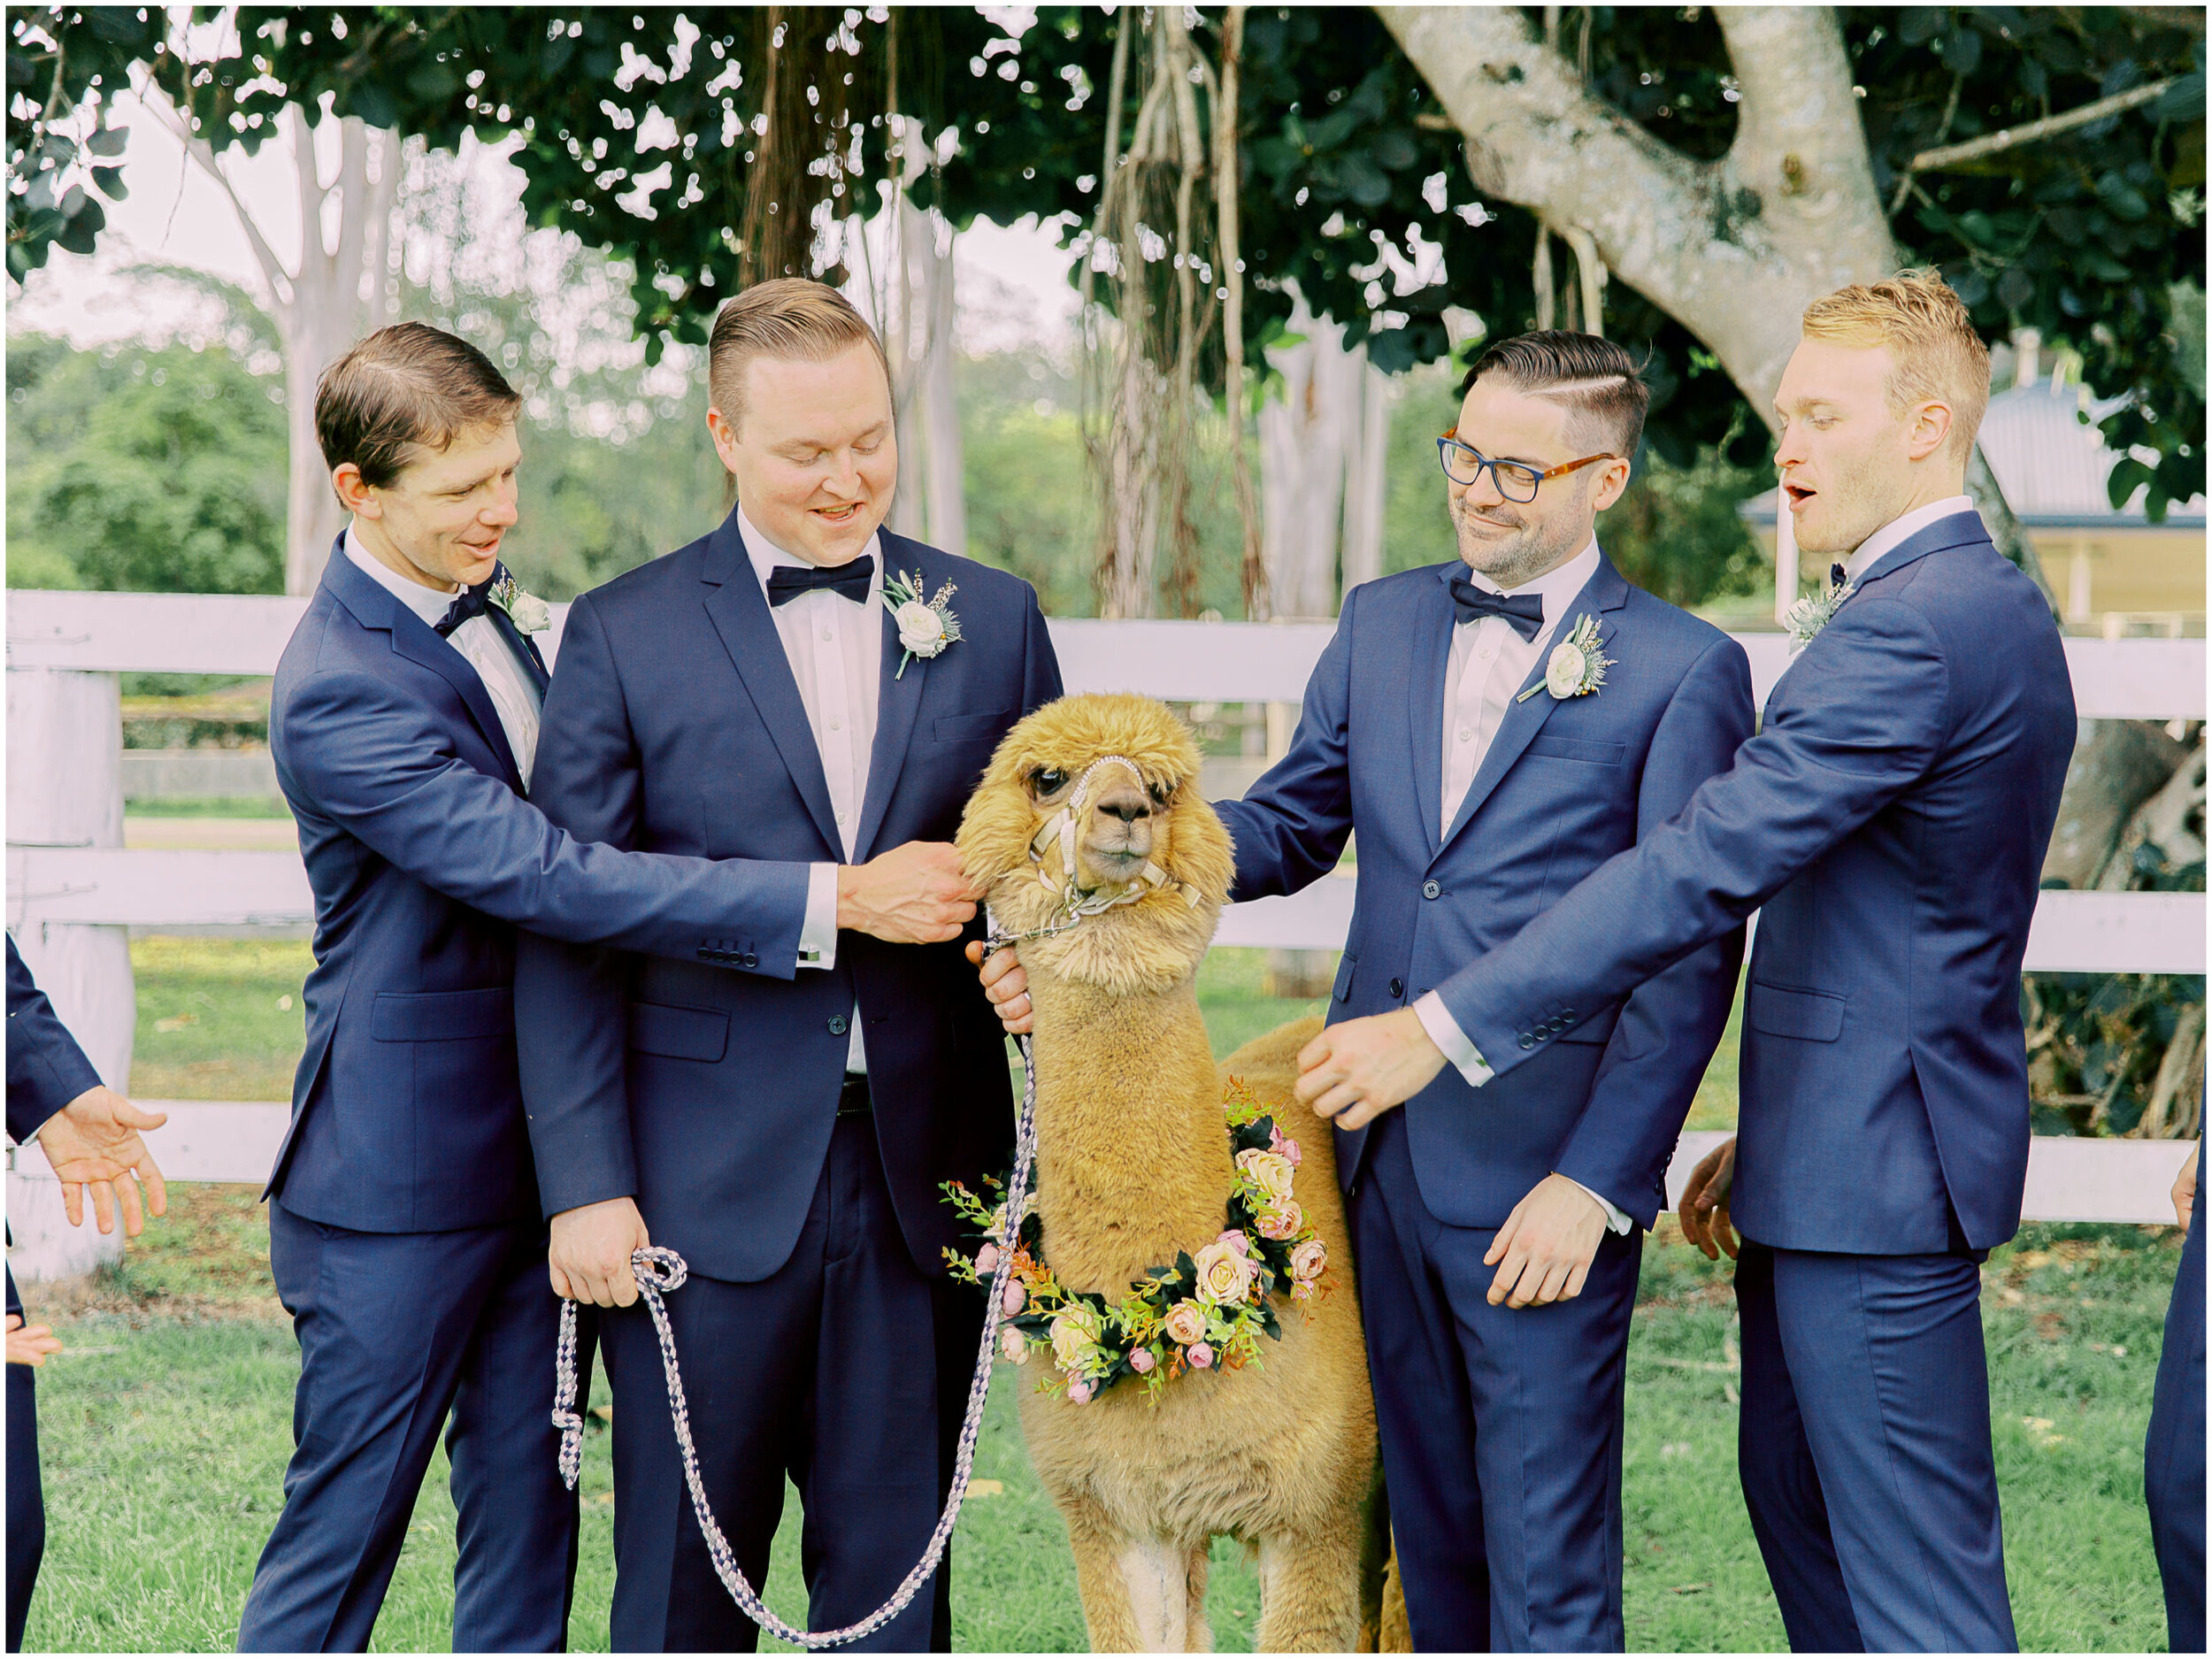 brisbane-film-wedding-photographer-lauren-olivia-luxury-wedding-australia-01-14.jpg